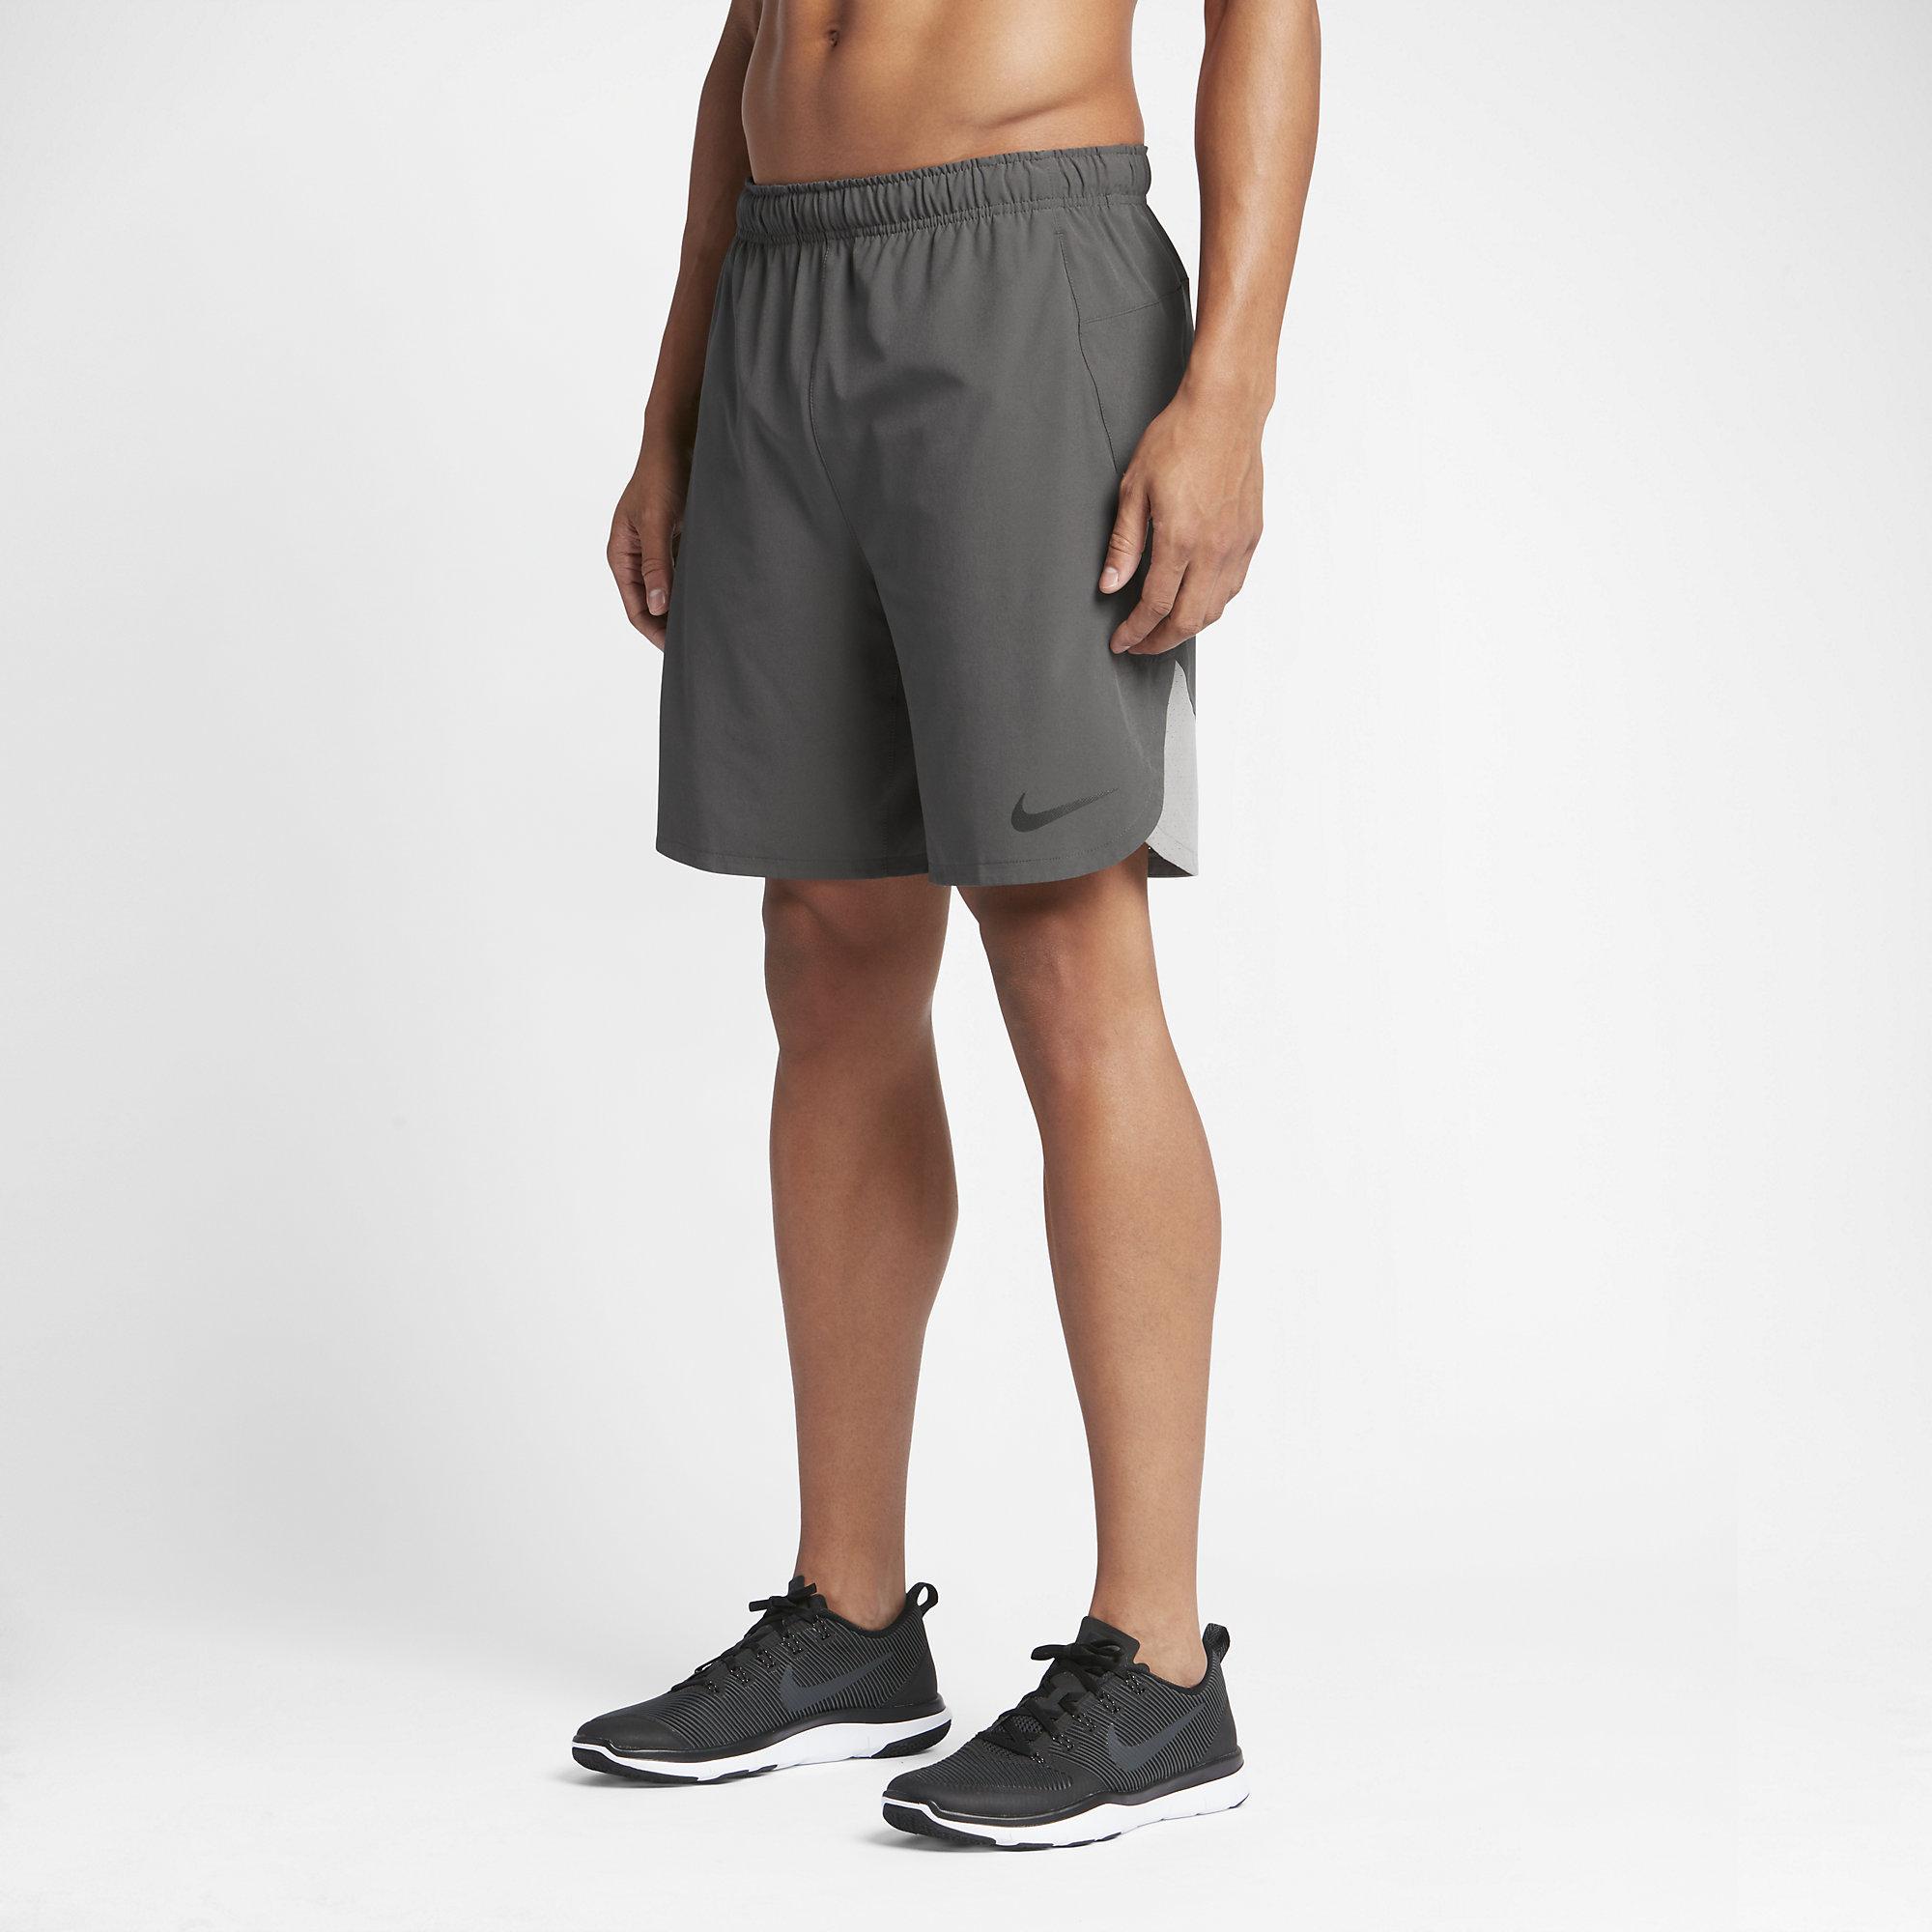 9f10f3a439d47 Nike Mens Flex Training Short - Mightnight Fog Dust Black ...